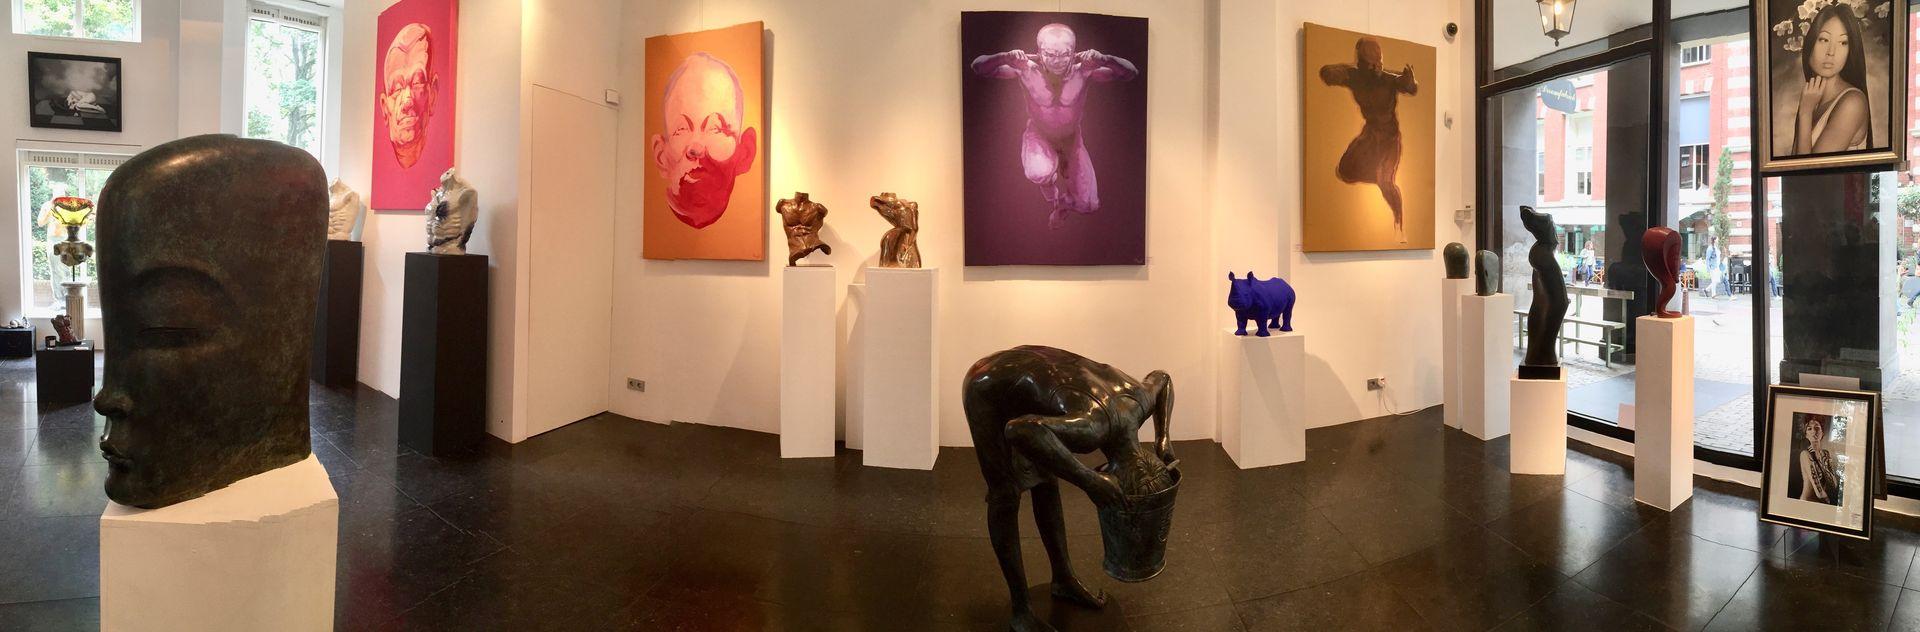 galerie Amsterdam